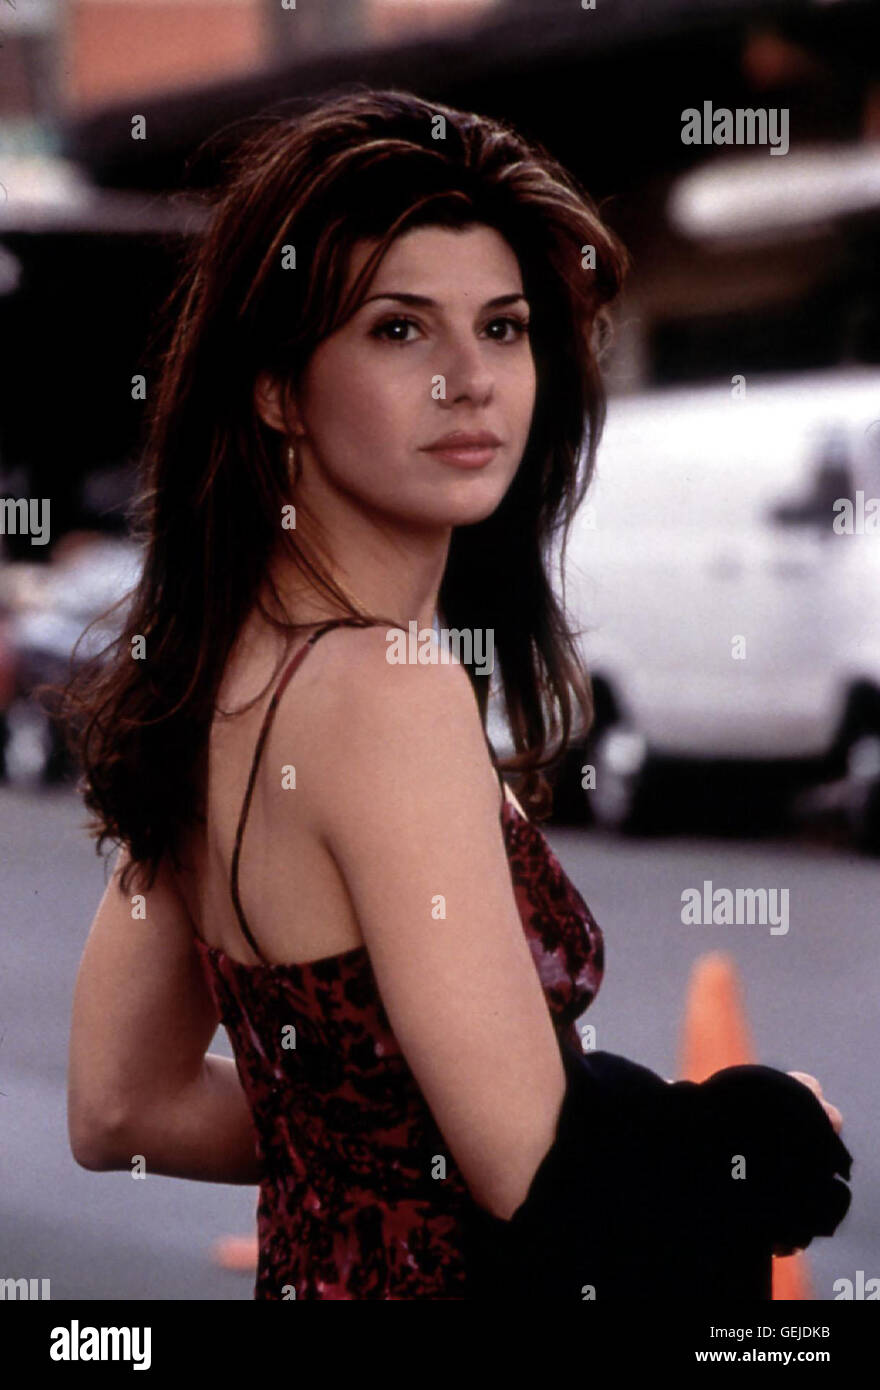 MARISA TOMEI, 2000 Liz (Marisa Tomei) *** Local Caption *** 2000, Someone Like You, Someone Like You - Stock Image